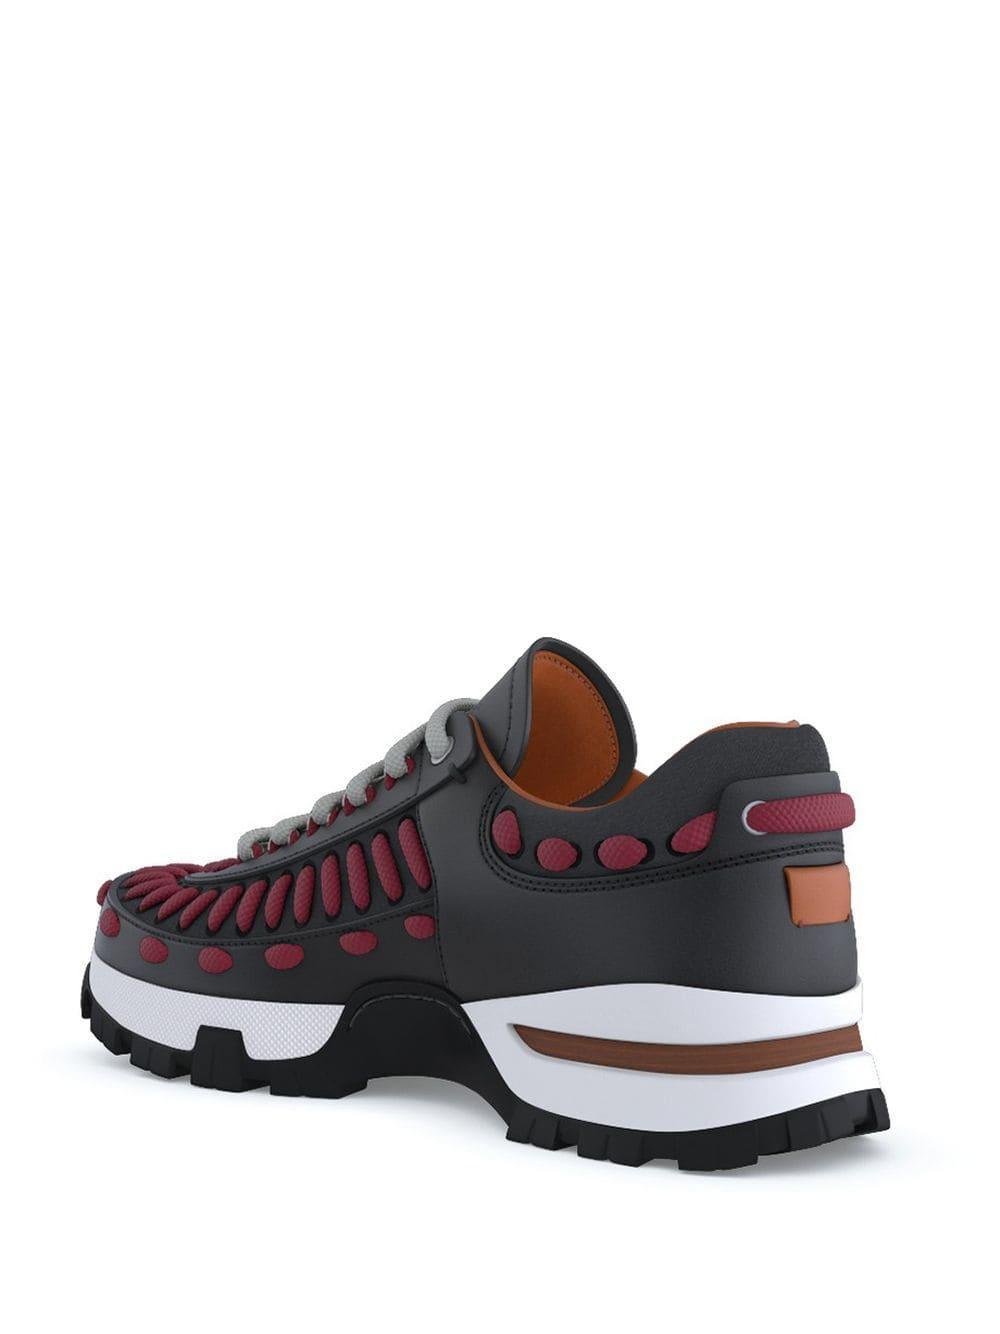 9f327a66 Men's Black My Claudio Sneakers